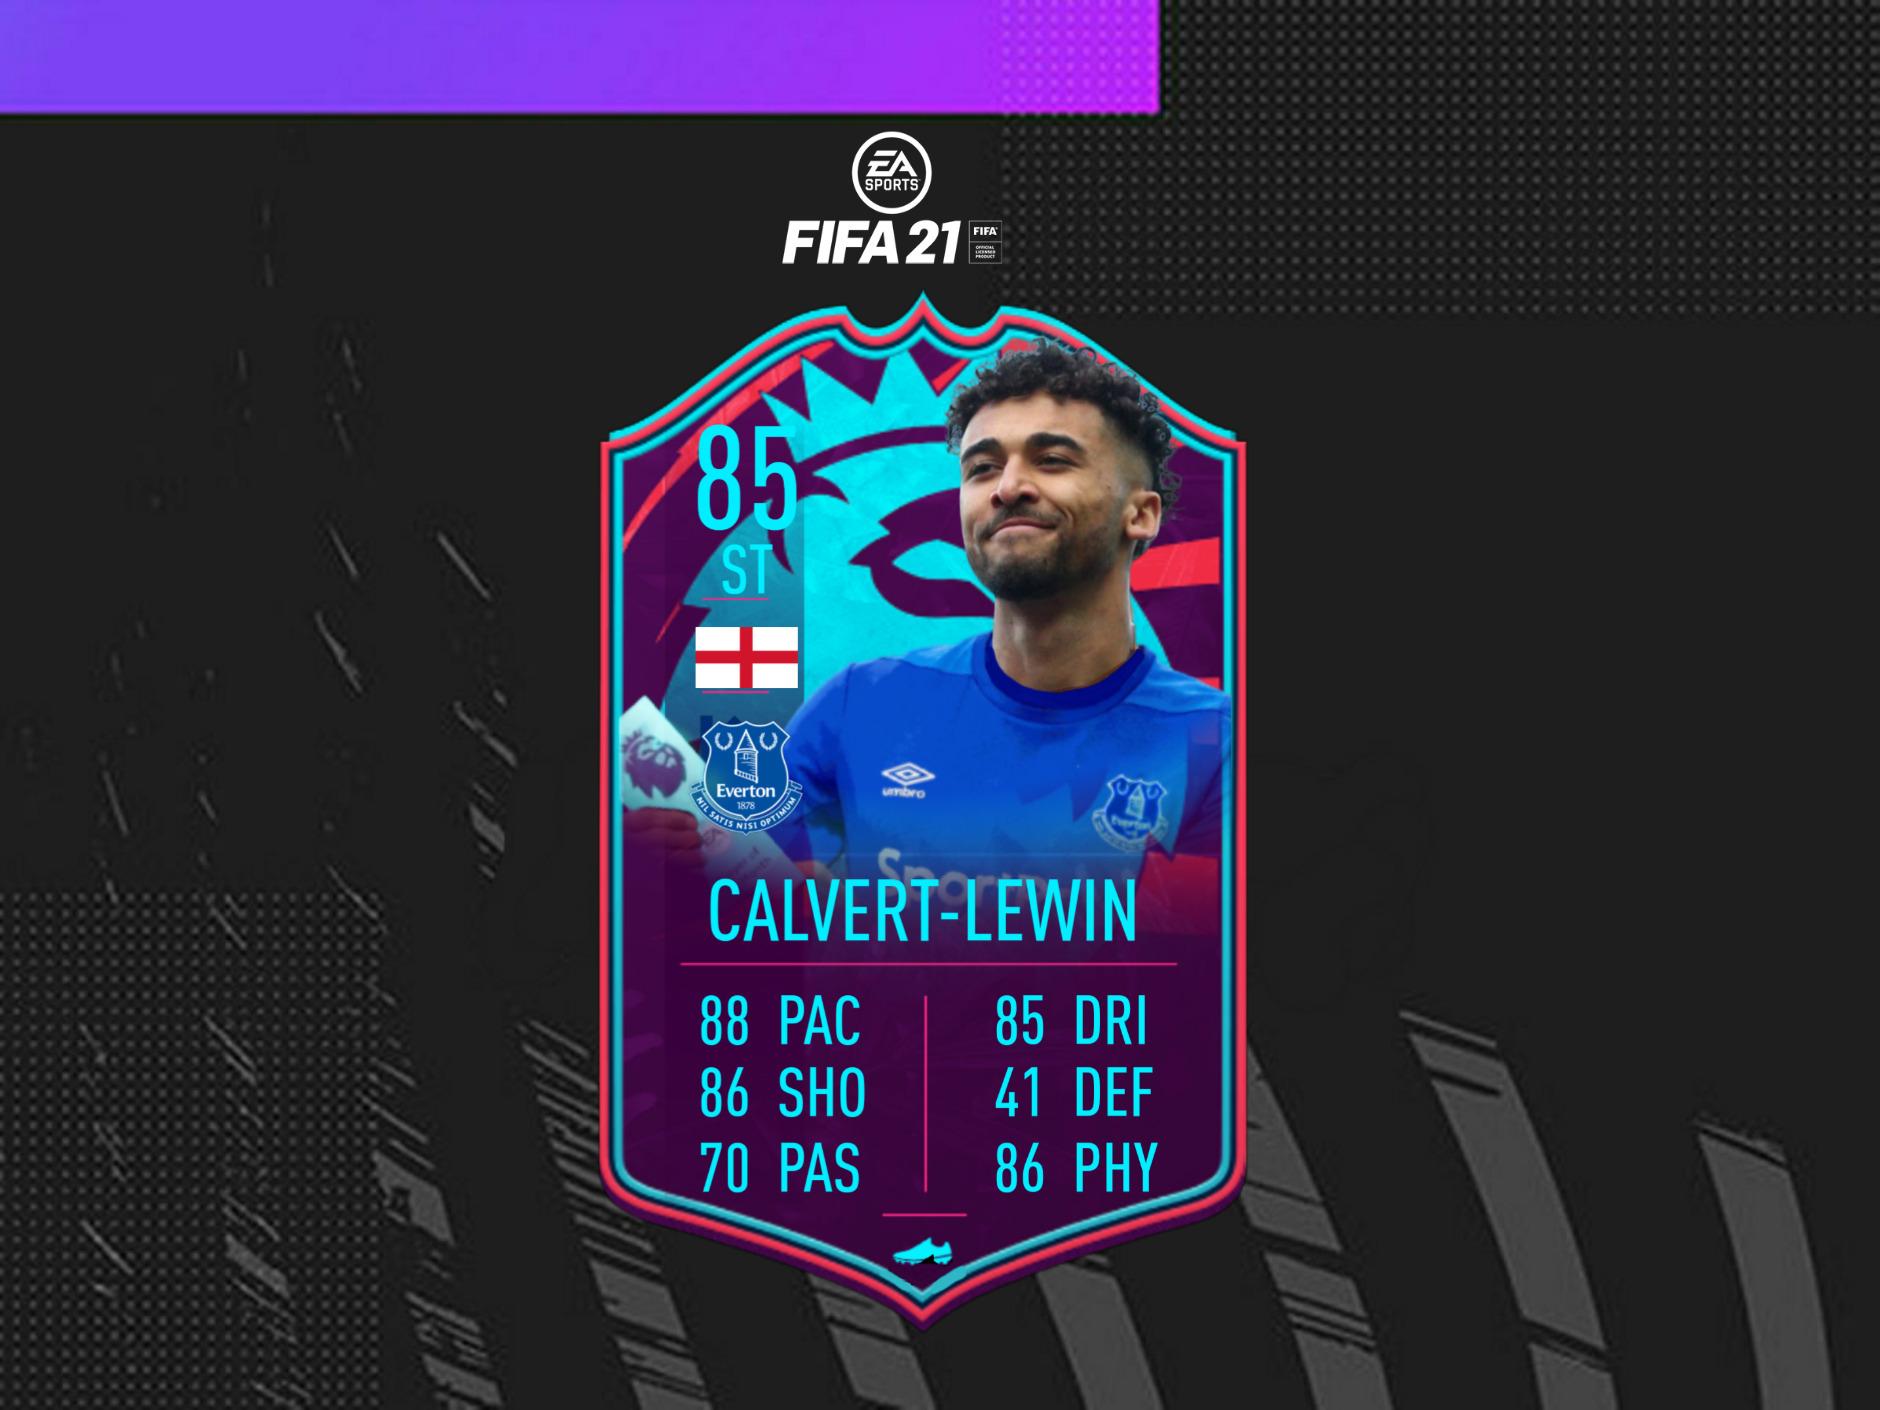 Should You Do The Calvert-Lewin POTM SBC In FIFA 21? Premier League Striker Is The First Big SBC In FUT